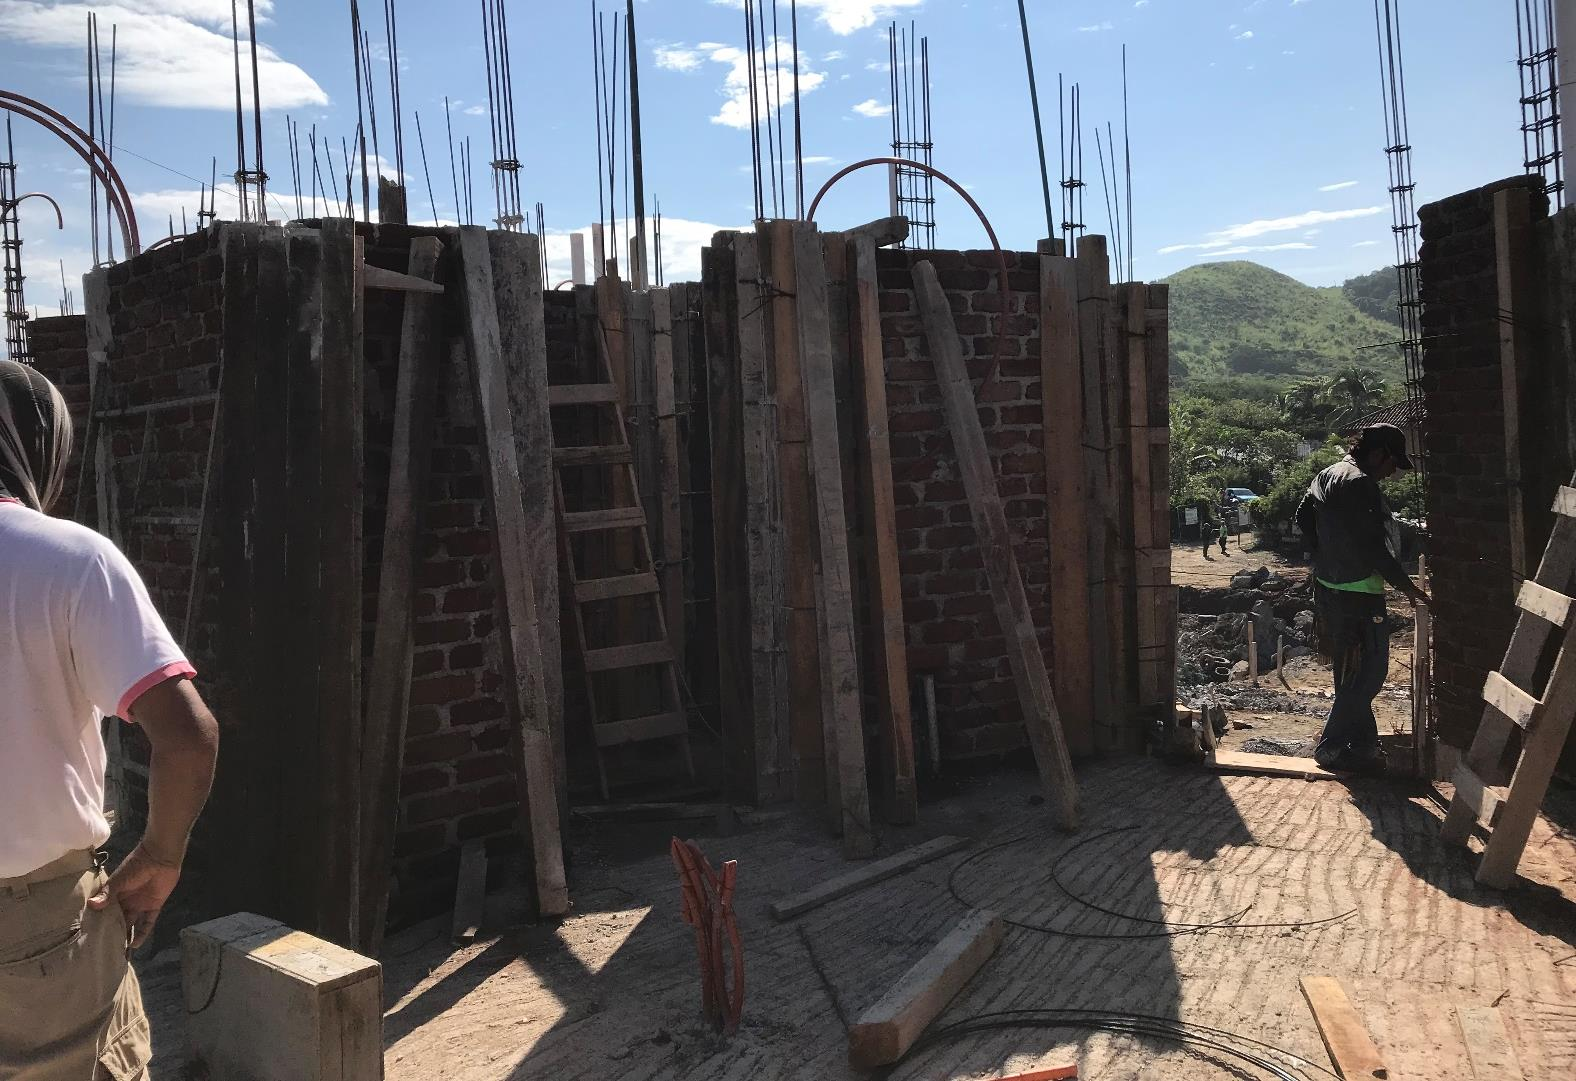 REPORTE-FOTOGRAFICO-PUNTA-MAJAHUA-23-SEPTIEMBRE-DEL-2018-027.jpg